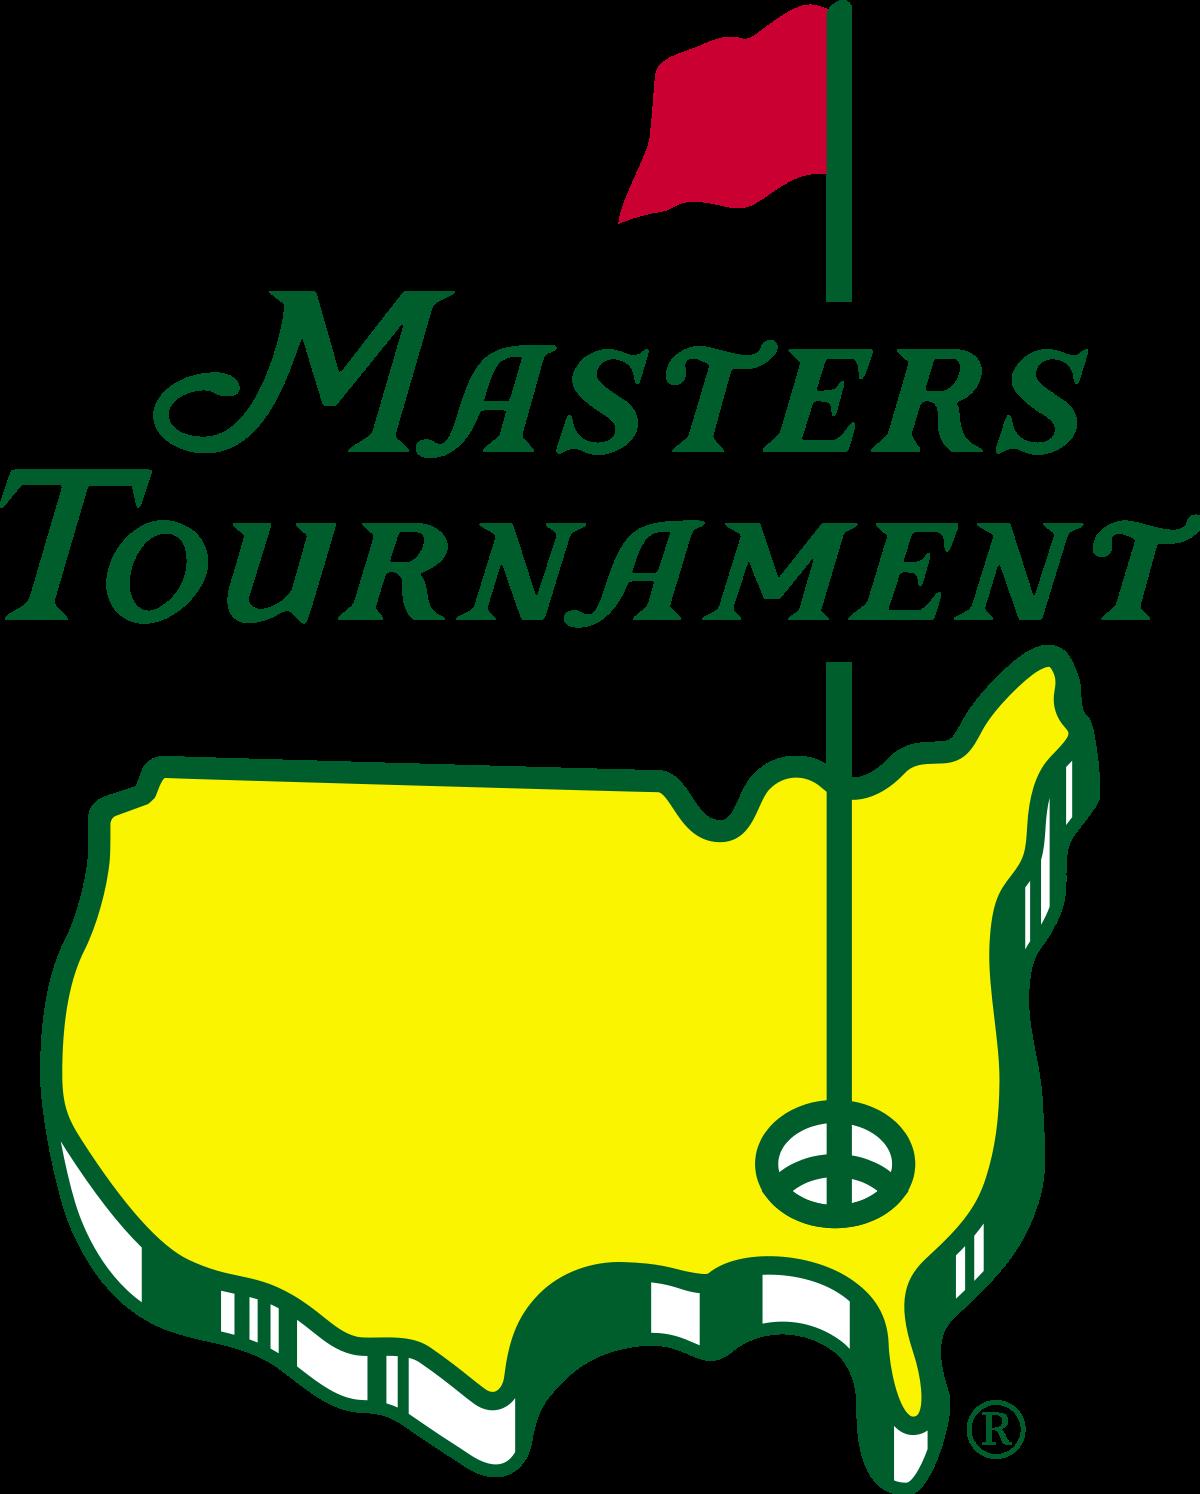 Desert classic golf tournament 2019 logo clipart graphic transparent Masters Tournament - Wikipedia graphic transparent